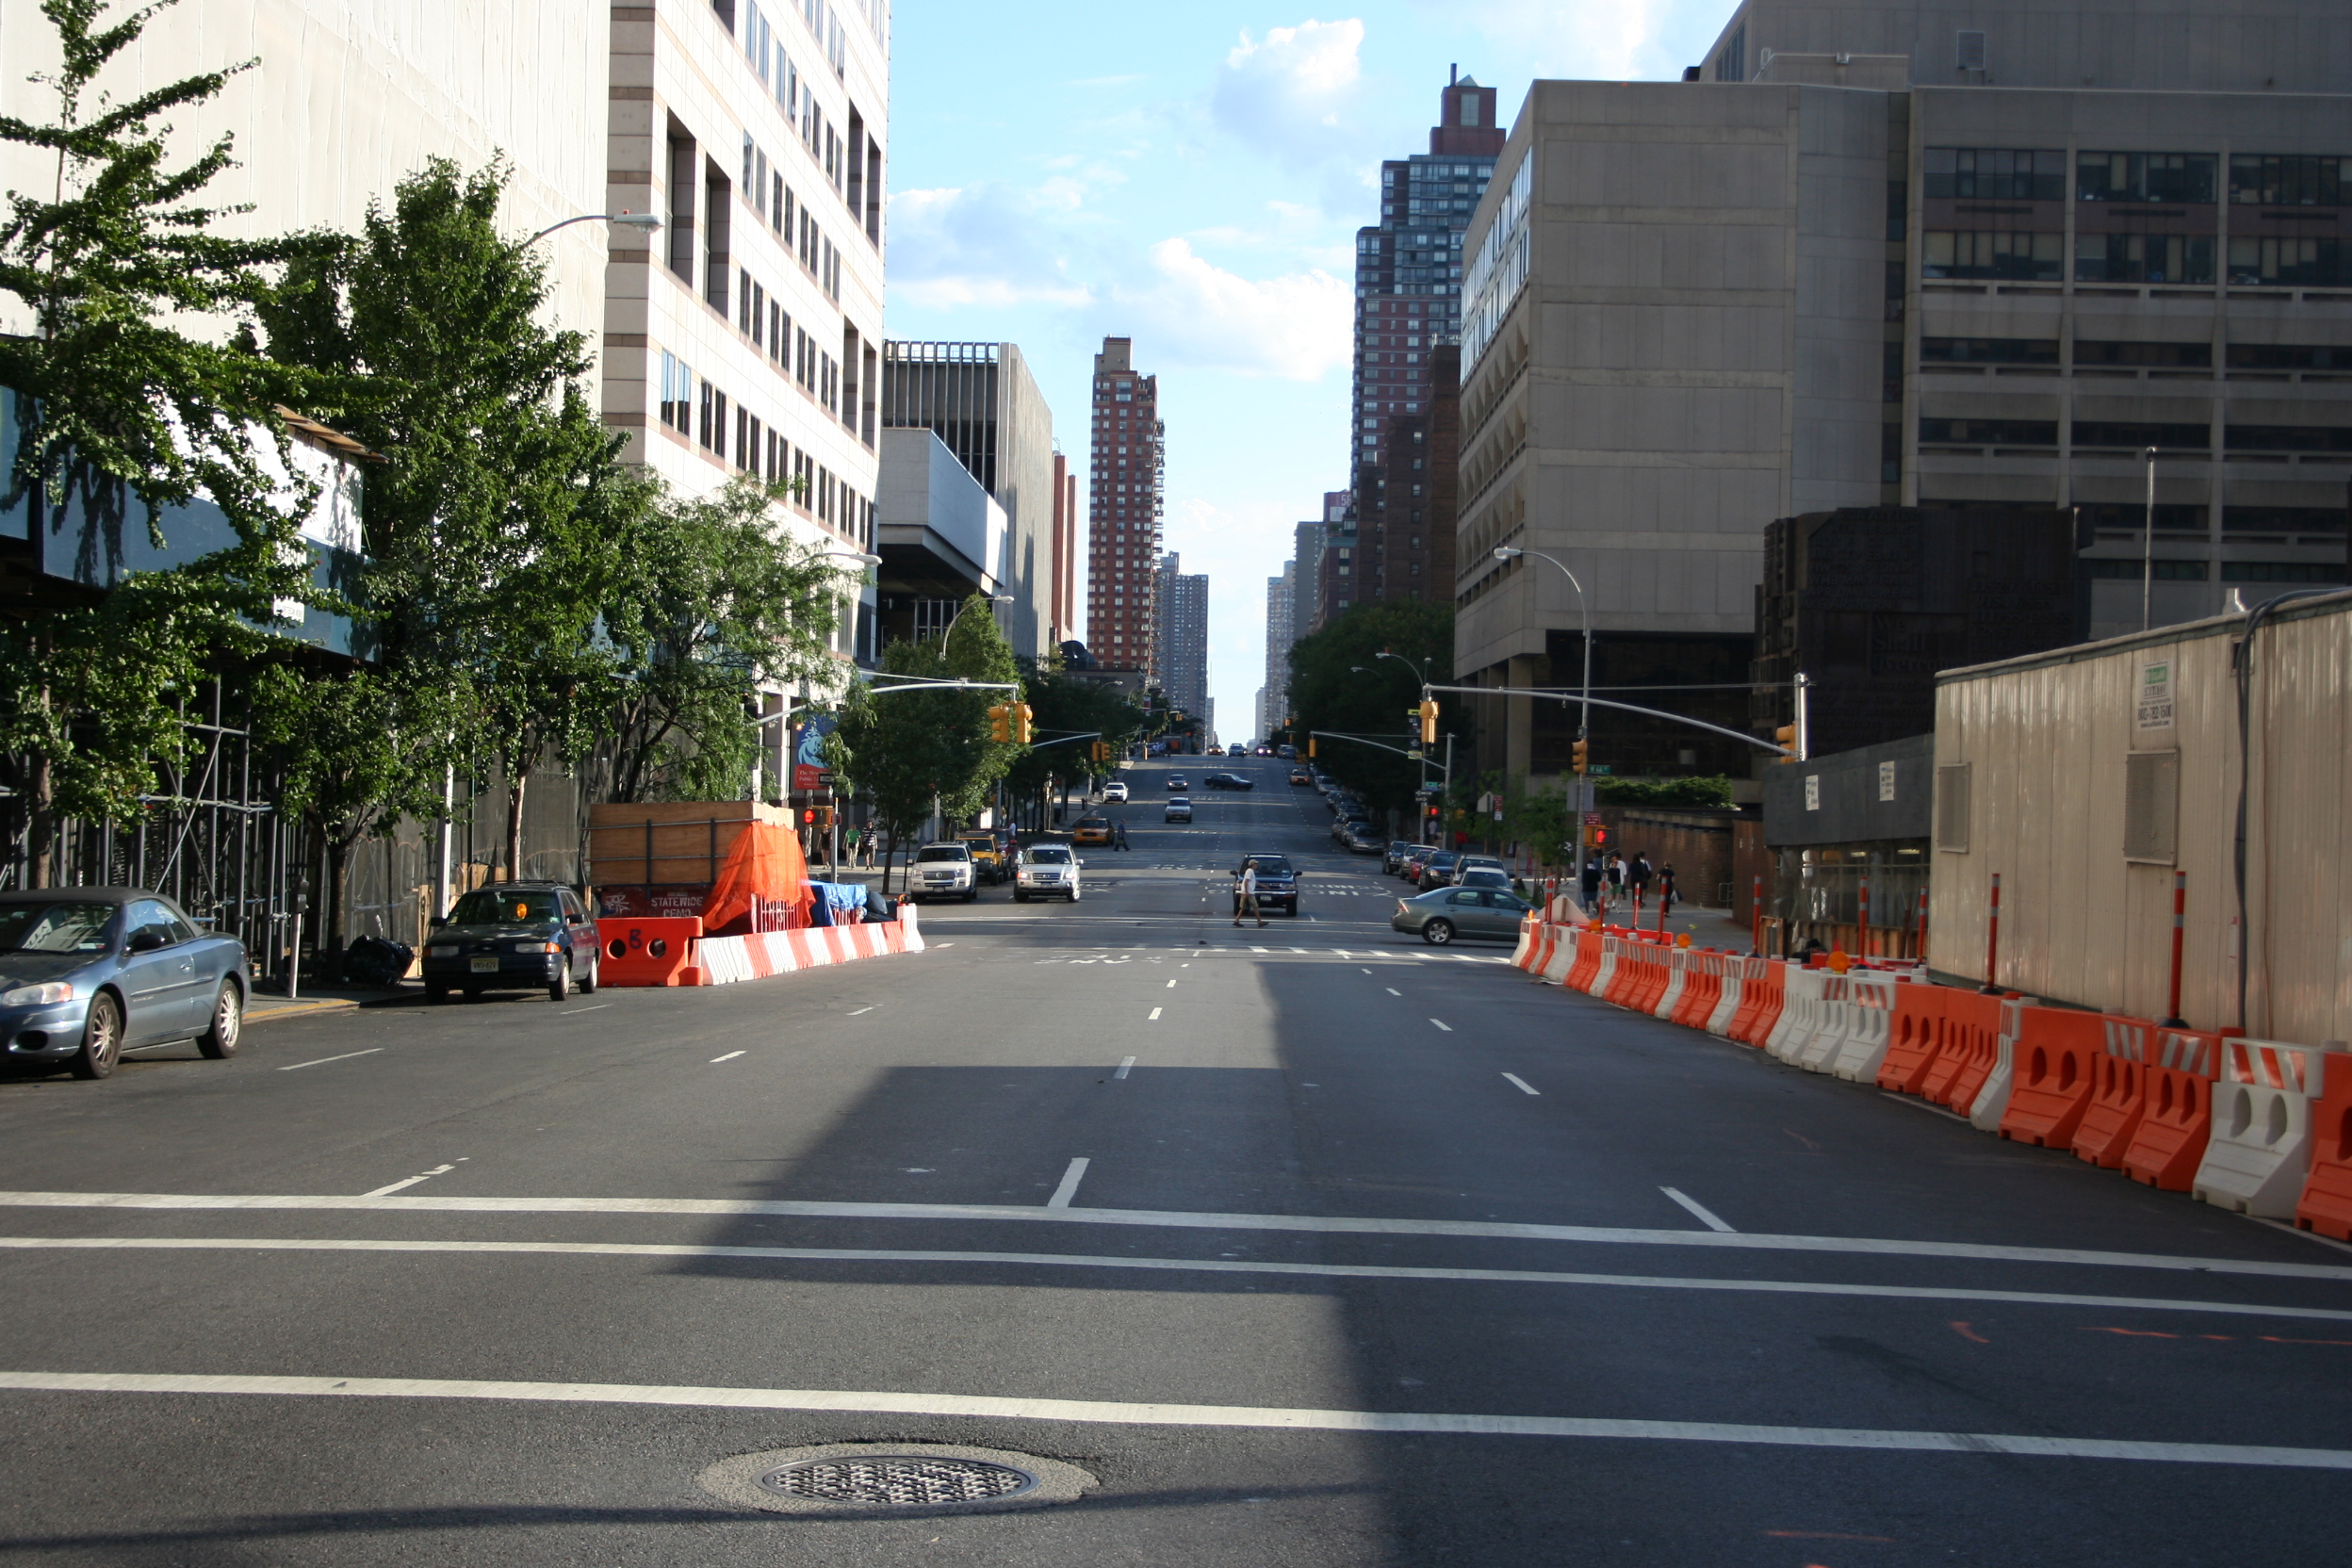 Midgets per square mile new york 13